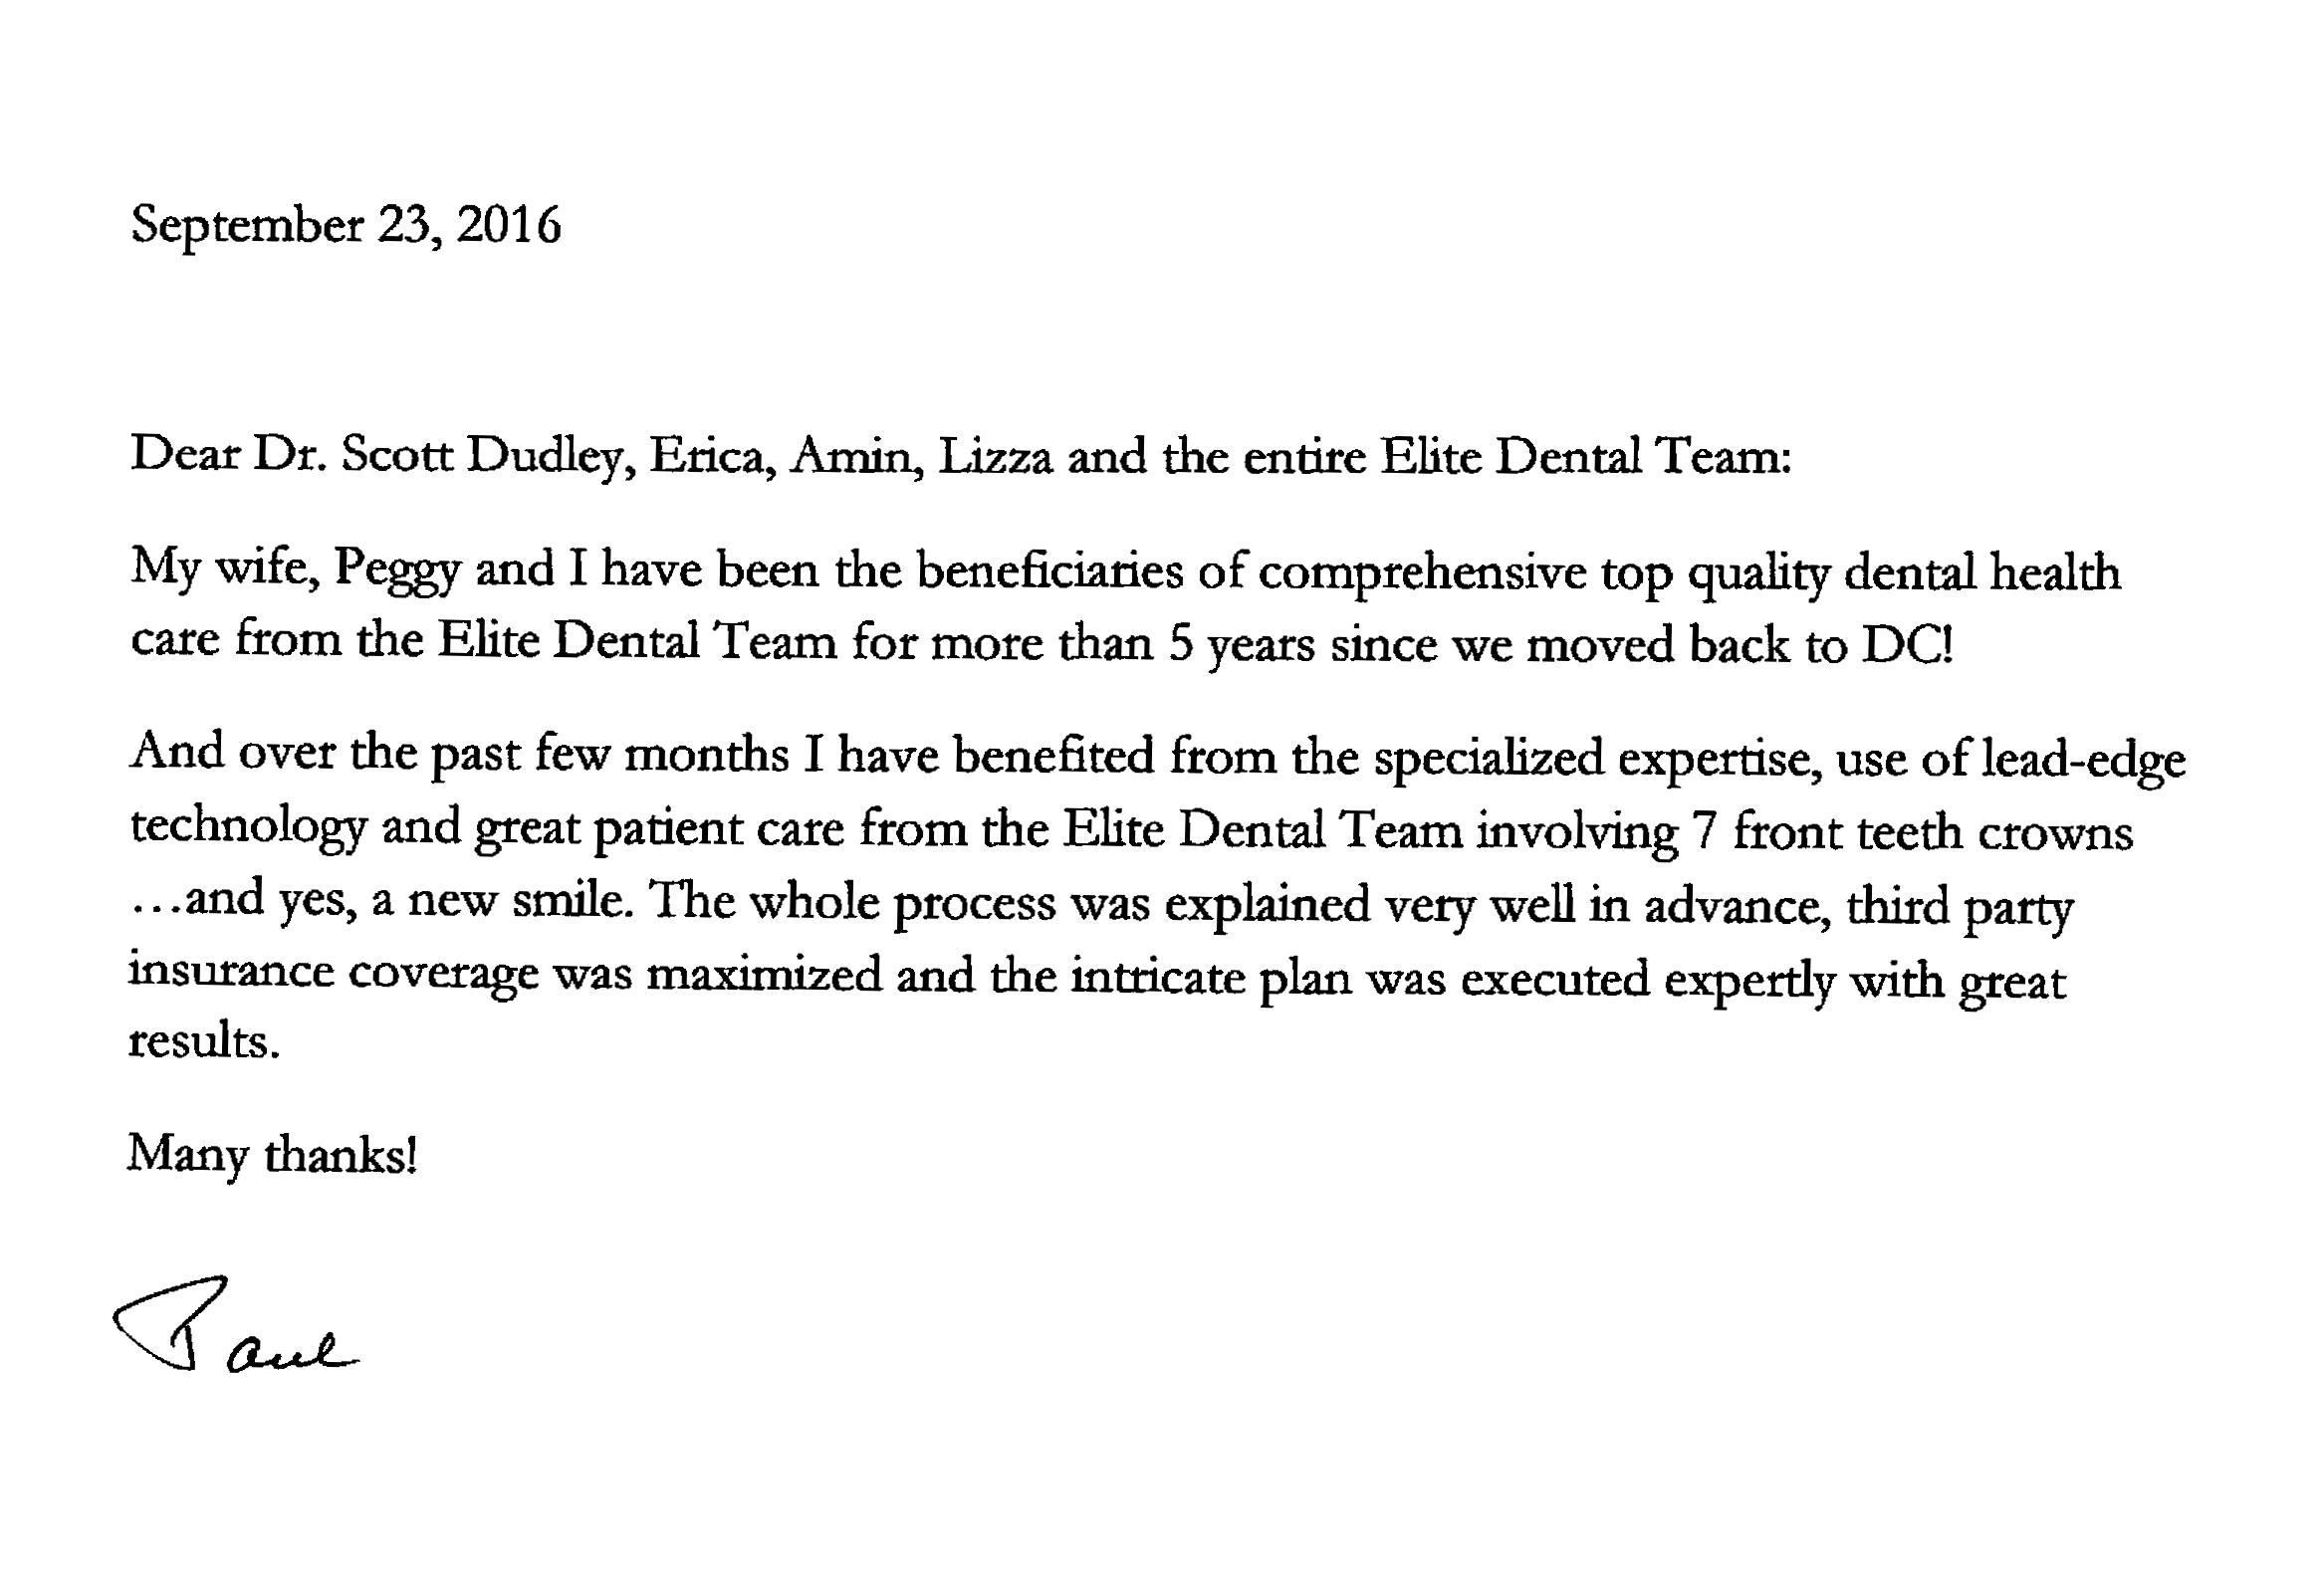 Thanks for the letter, Paul!